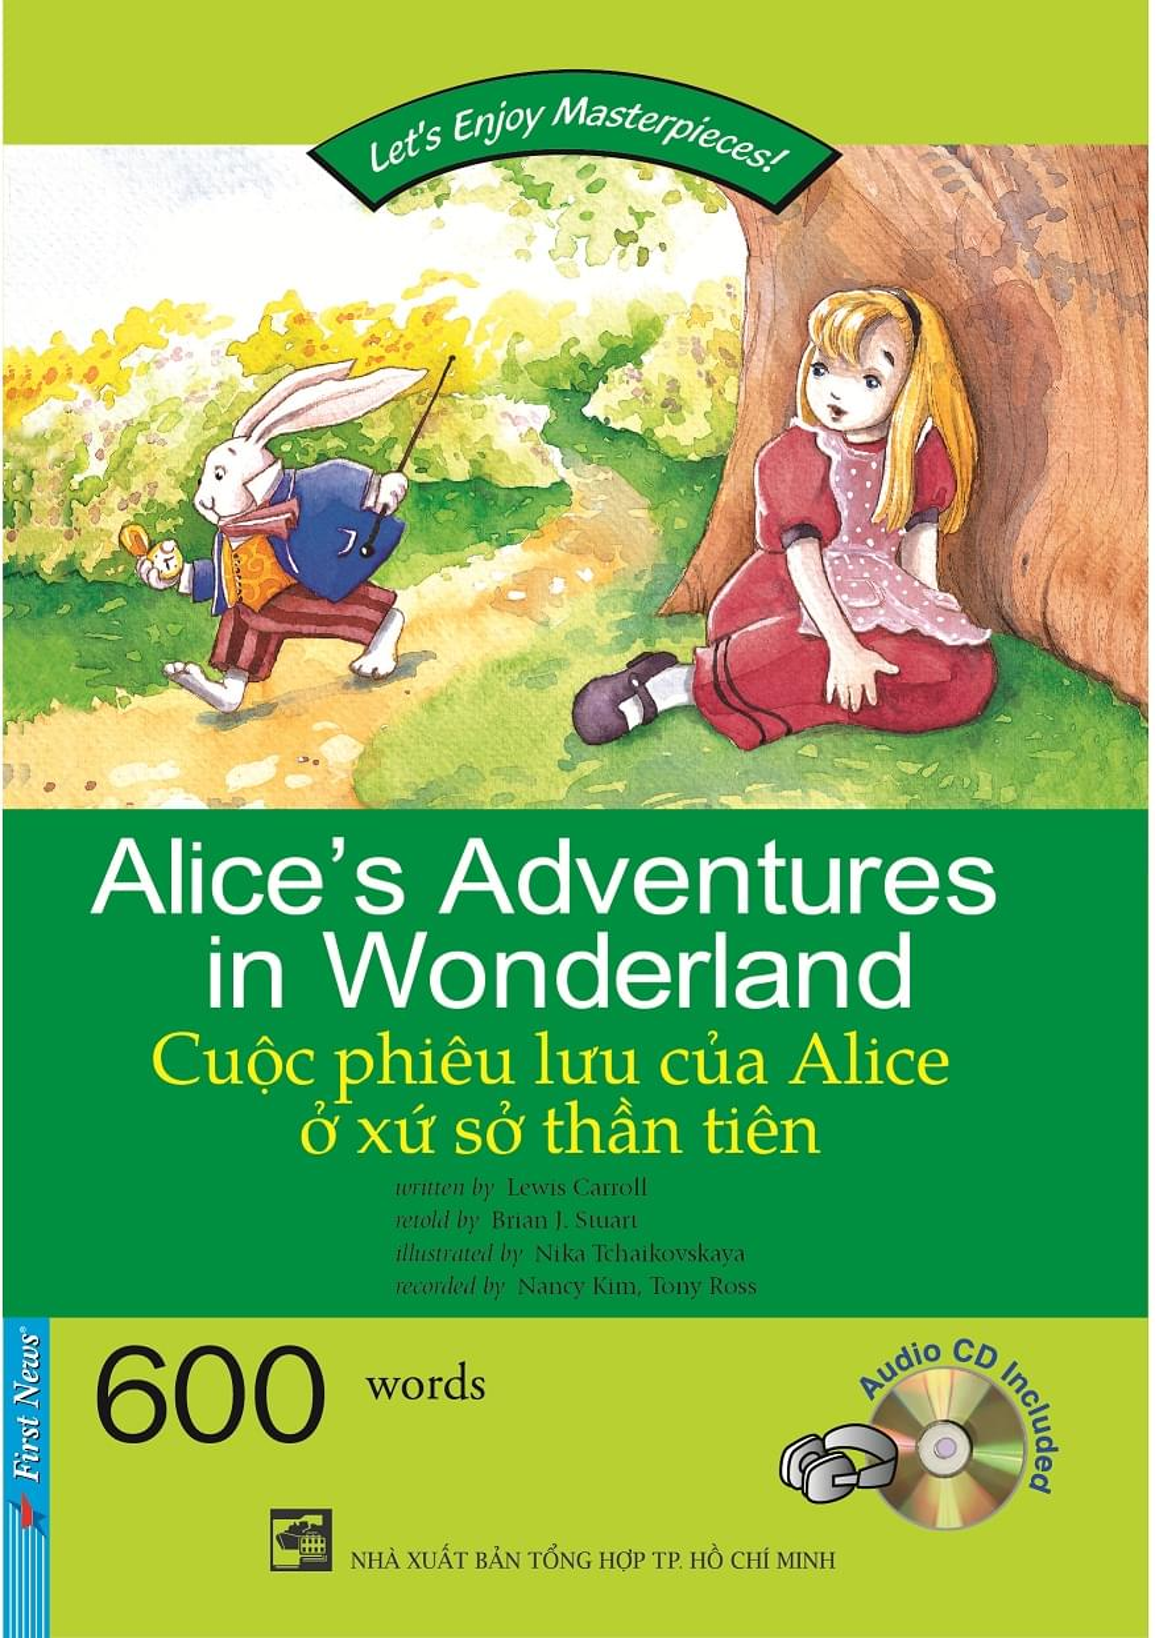 happy-reader-alieces-adventures-in-wonderland.jpg